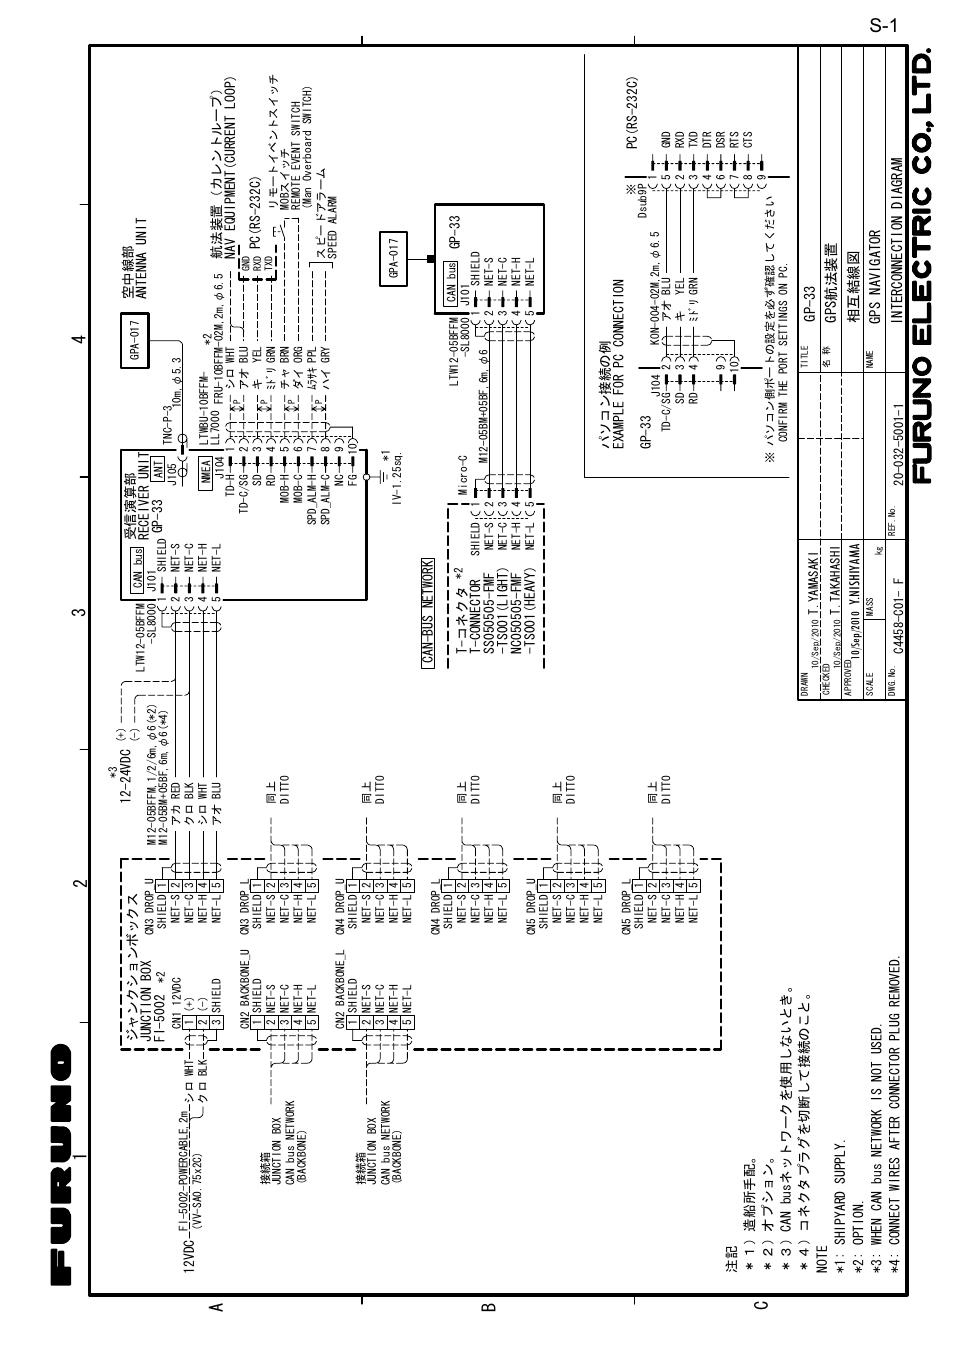 hight resolution of interconnection diagram y nishiyama furuno gp 33 user manual page 94